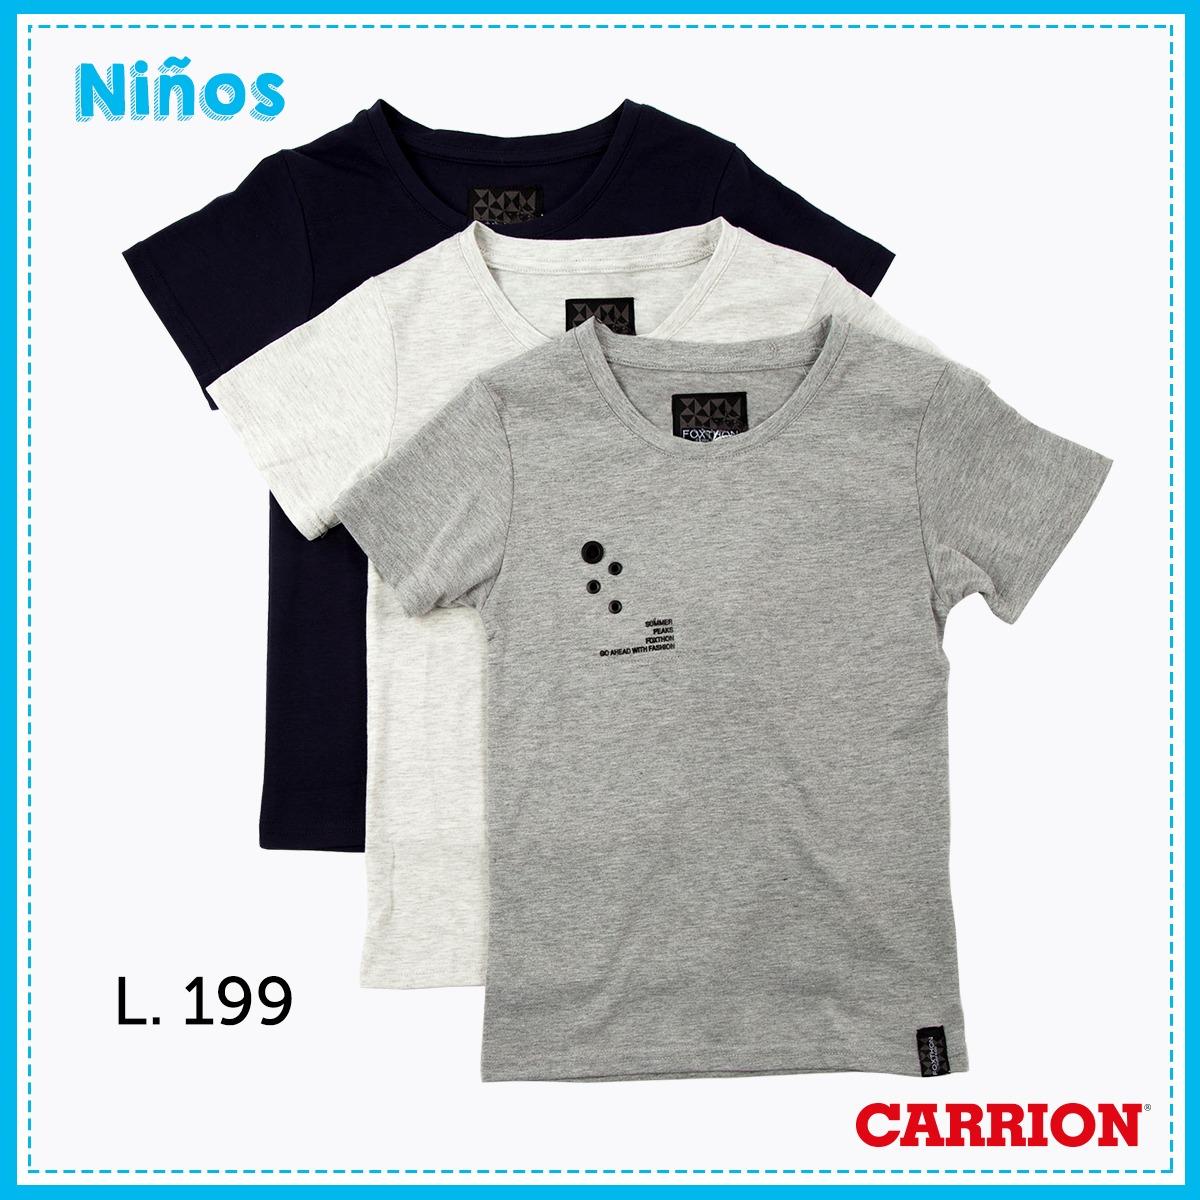 Camisetas básicas para  chicos #tiendascarrion https://t.co/hc8mMJnP8F